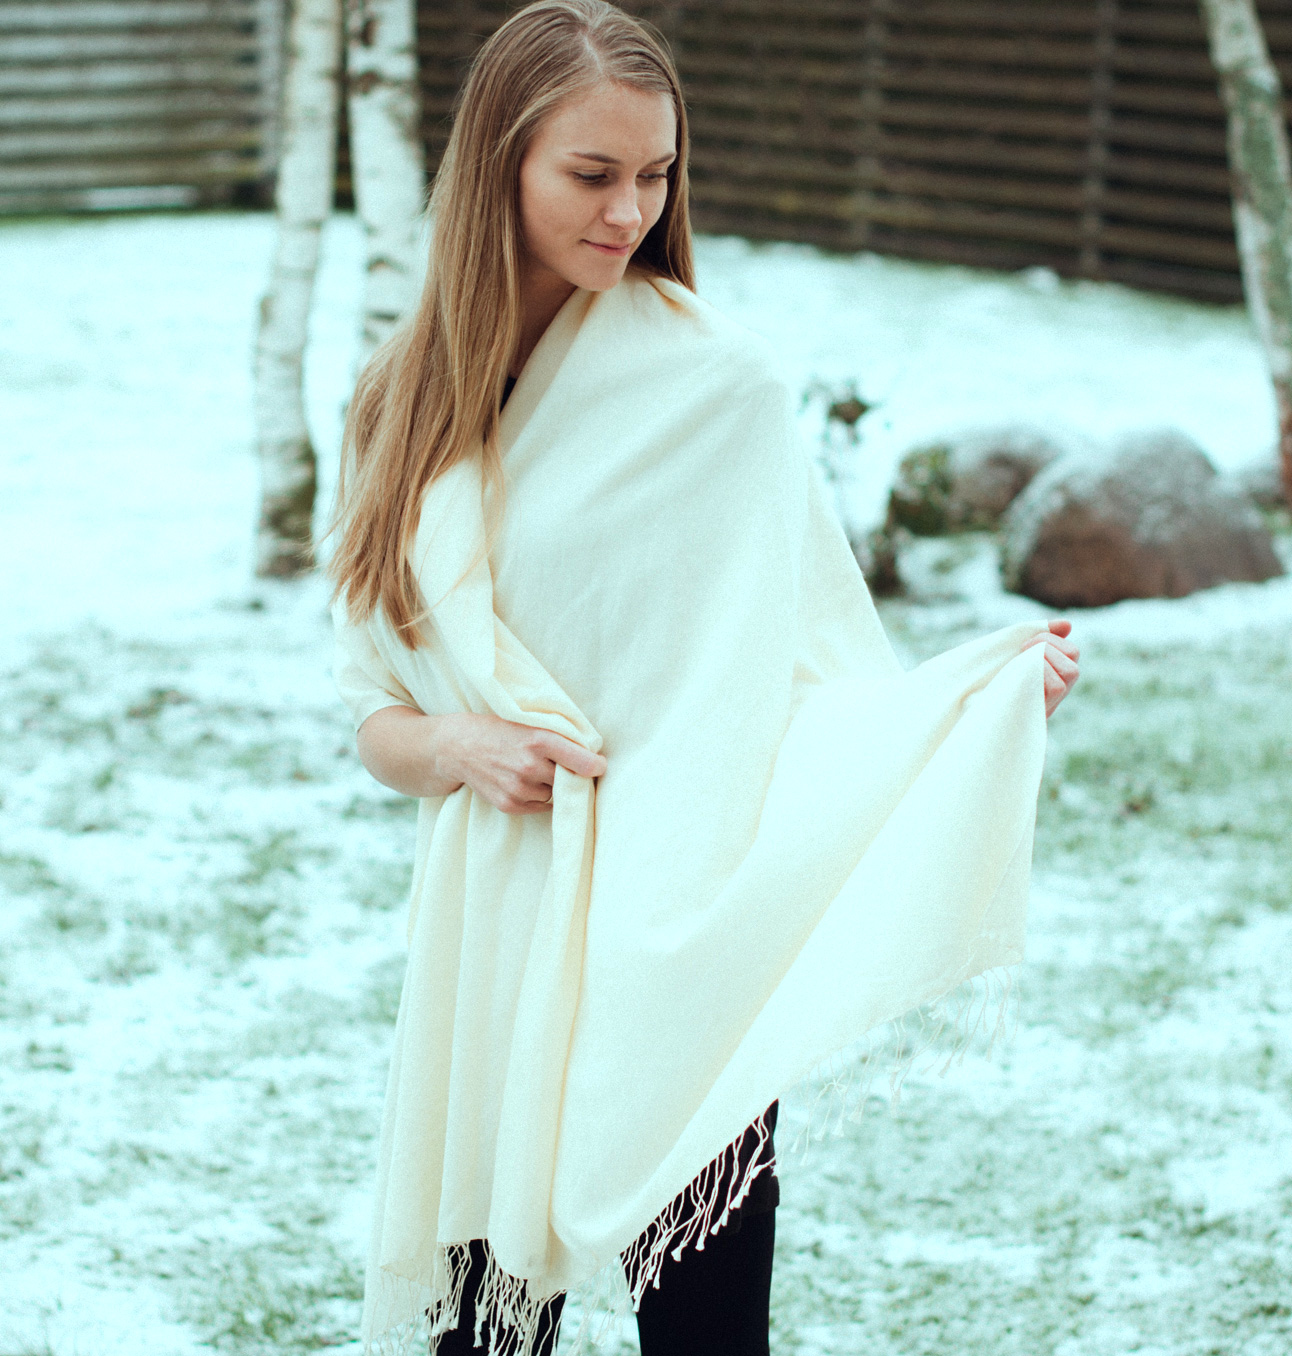 Pashmina Shawl - 90x200cm - 70% Cashmere / 30% Silk - Skyway